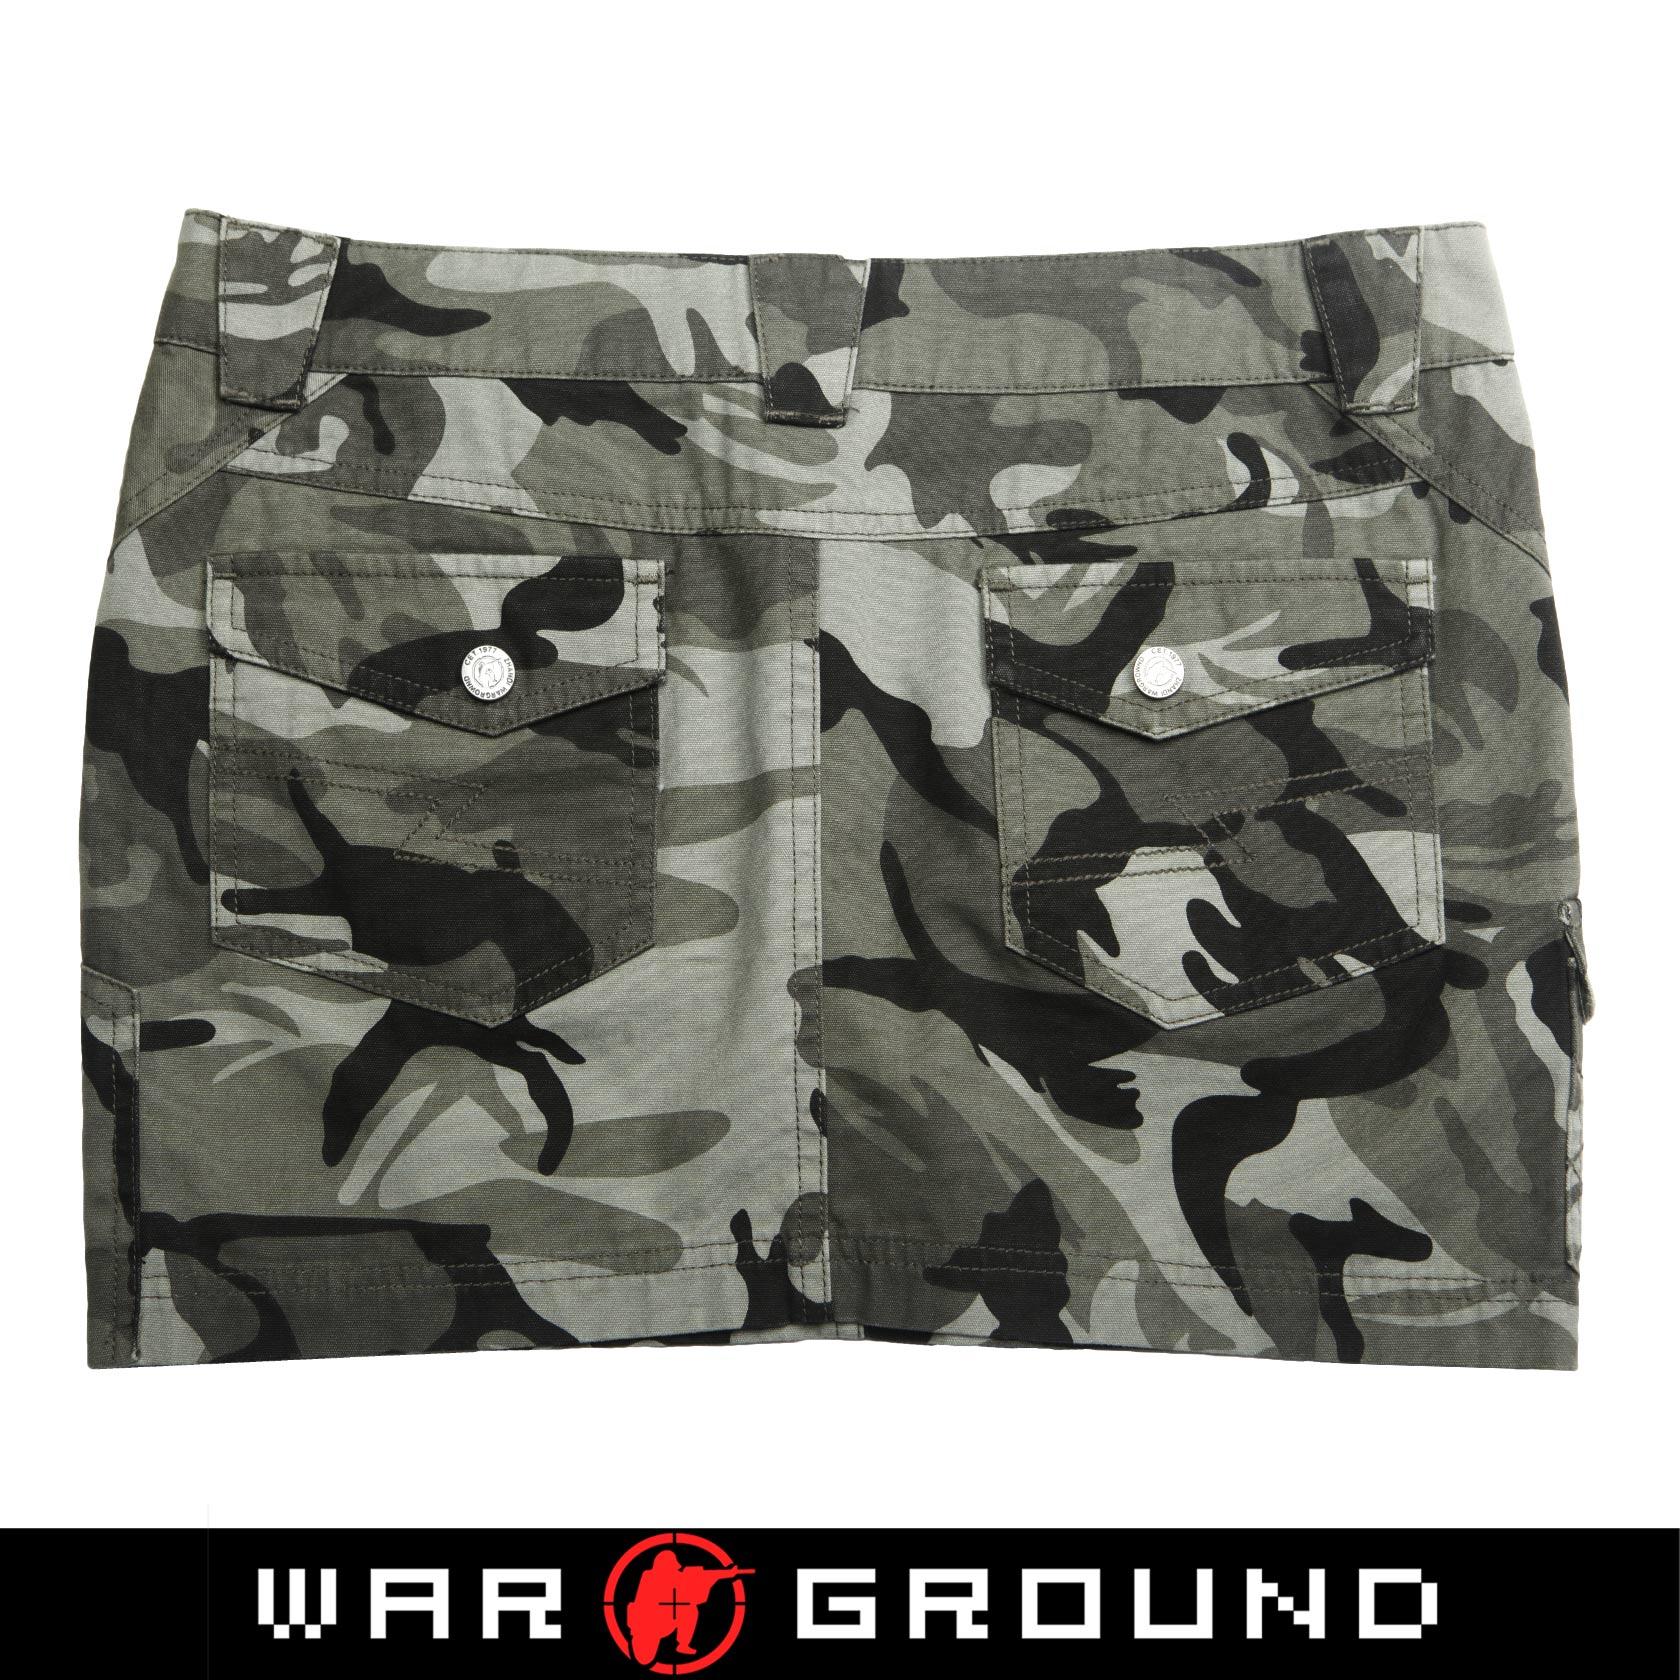 Камуфляжная юбка Battlefield wdq19903c Battlefield